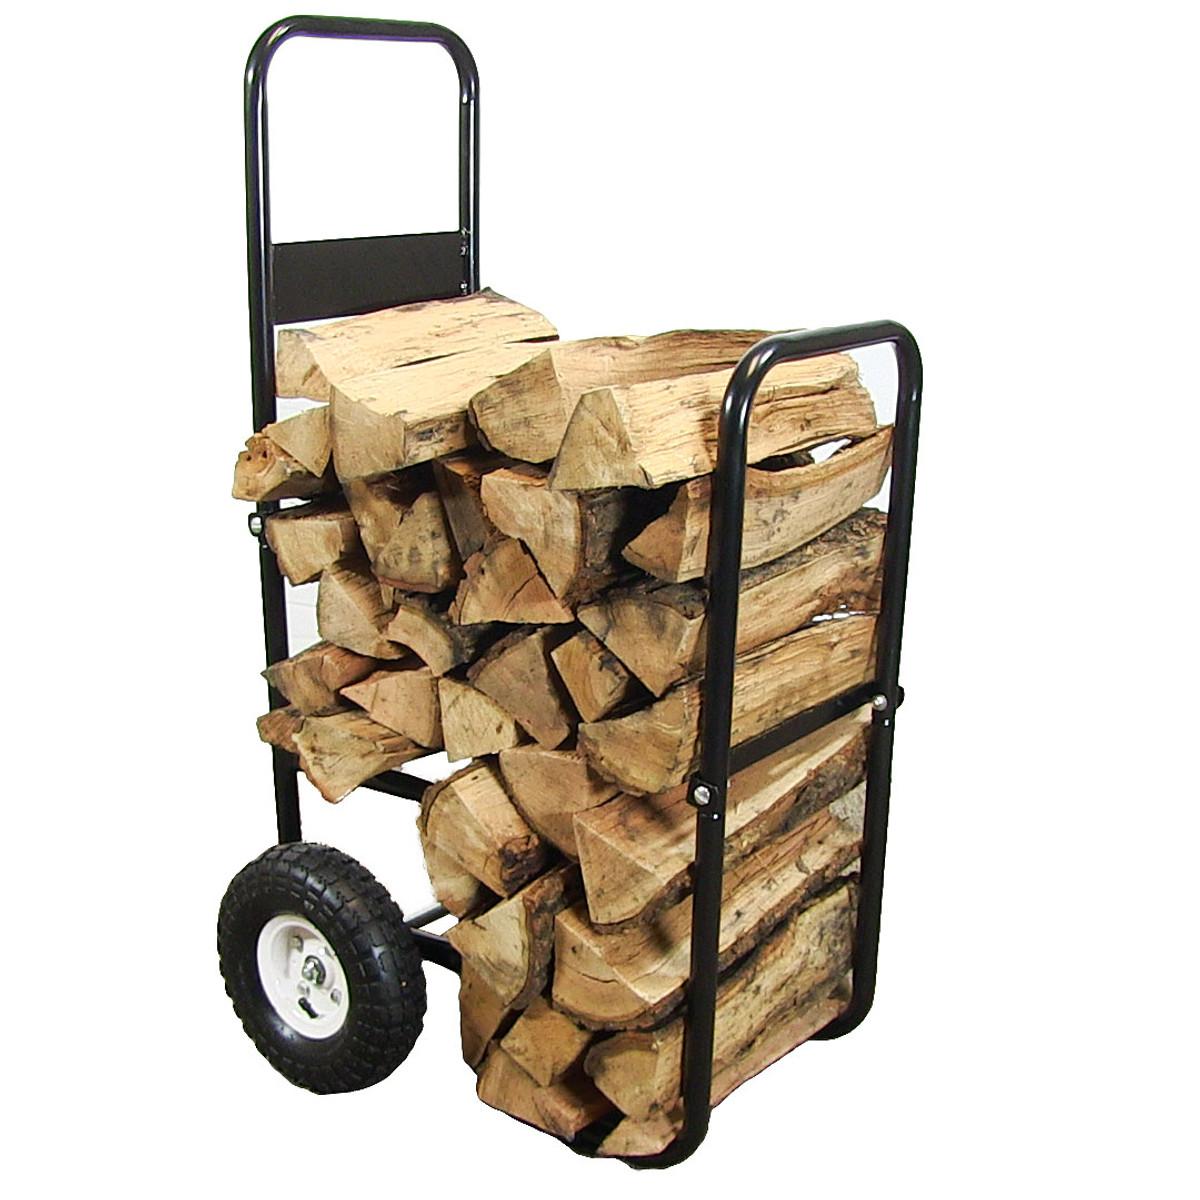 Sunnydaze Firewood Log Cart with Wheels